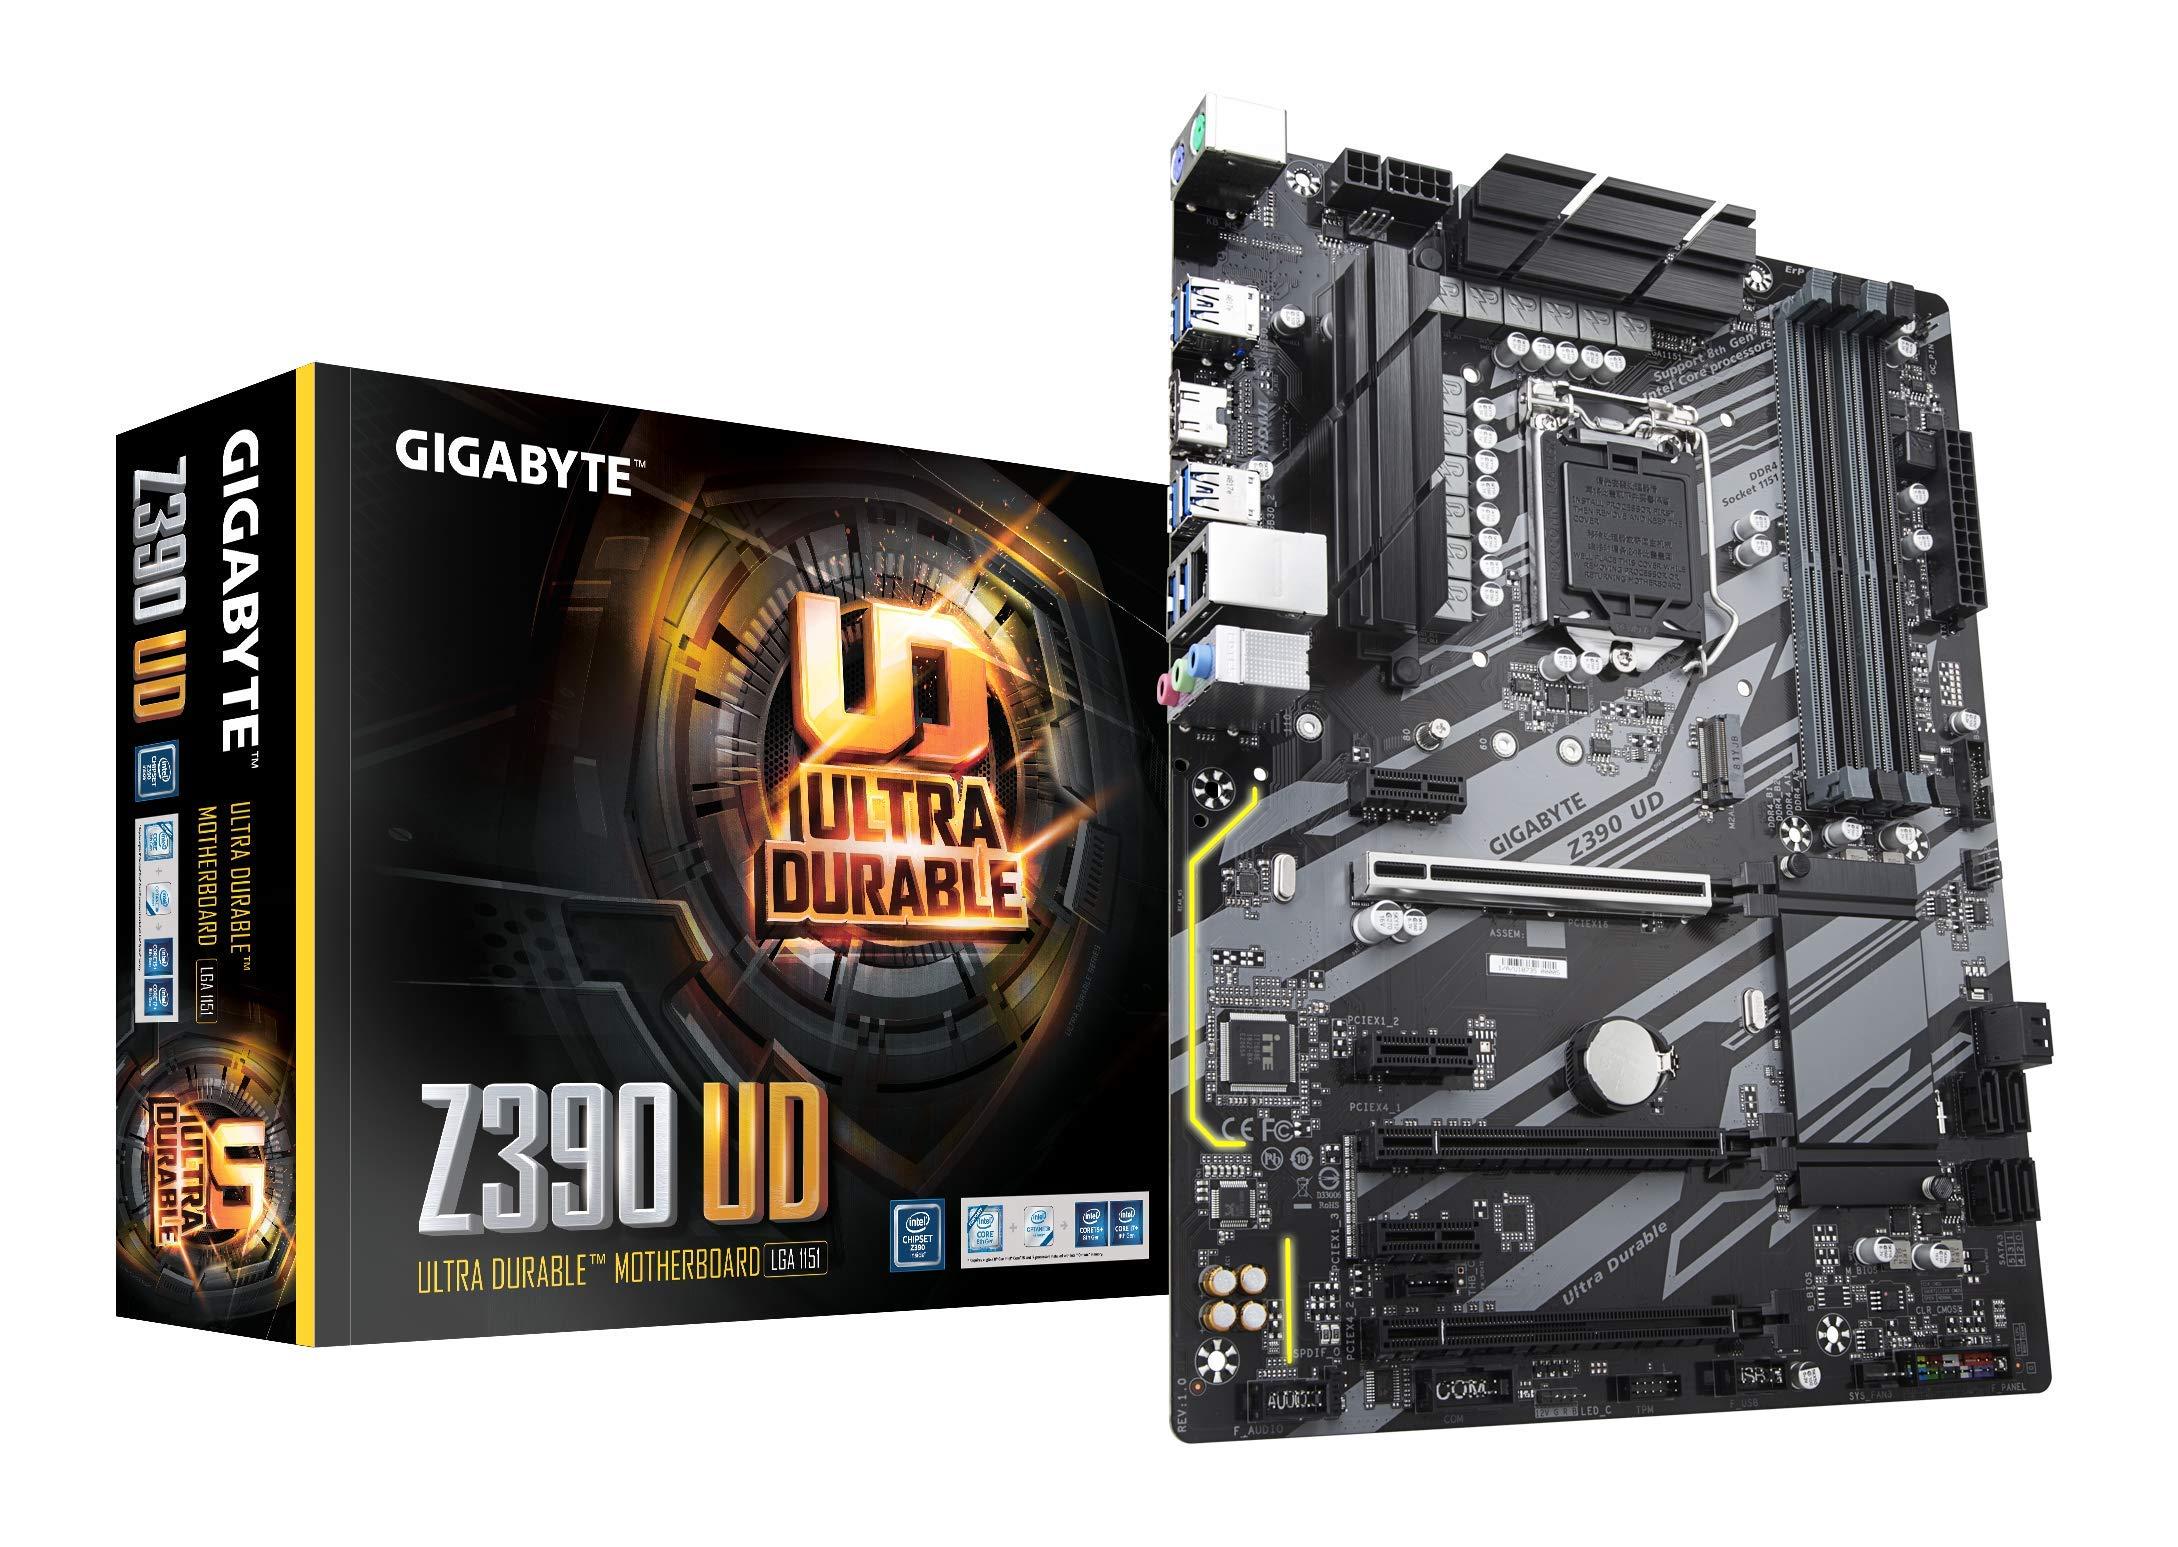 Gigabyte Z390 UD (Intel LGA1151/Z390/ATX/M.2/Realtek ALC887/Realtek 8118 Gaming LAN/HDMI/Gaming Motherboard) by Gigabyte